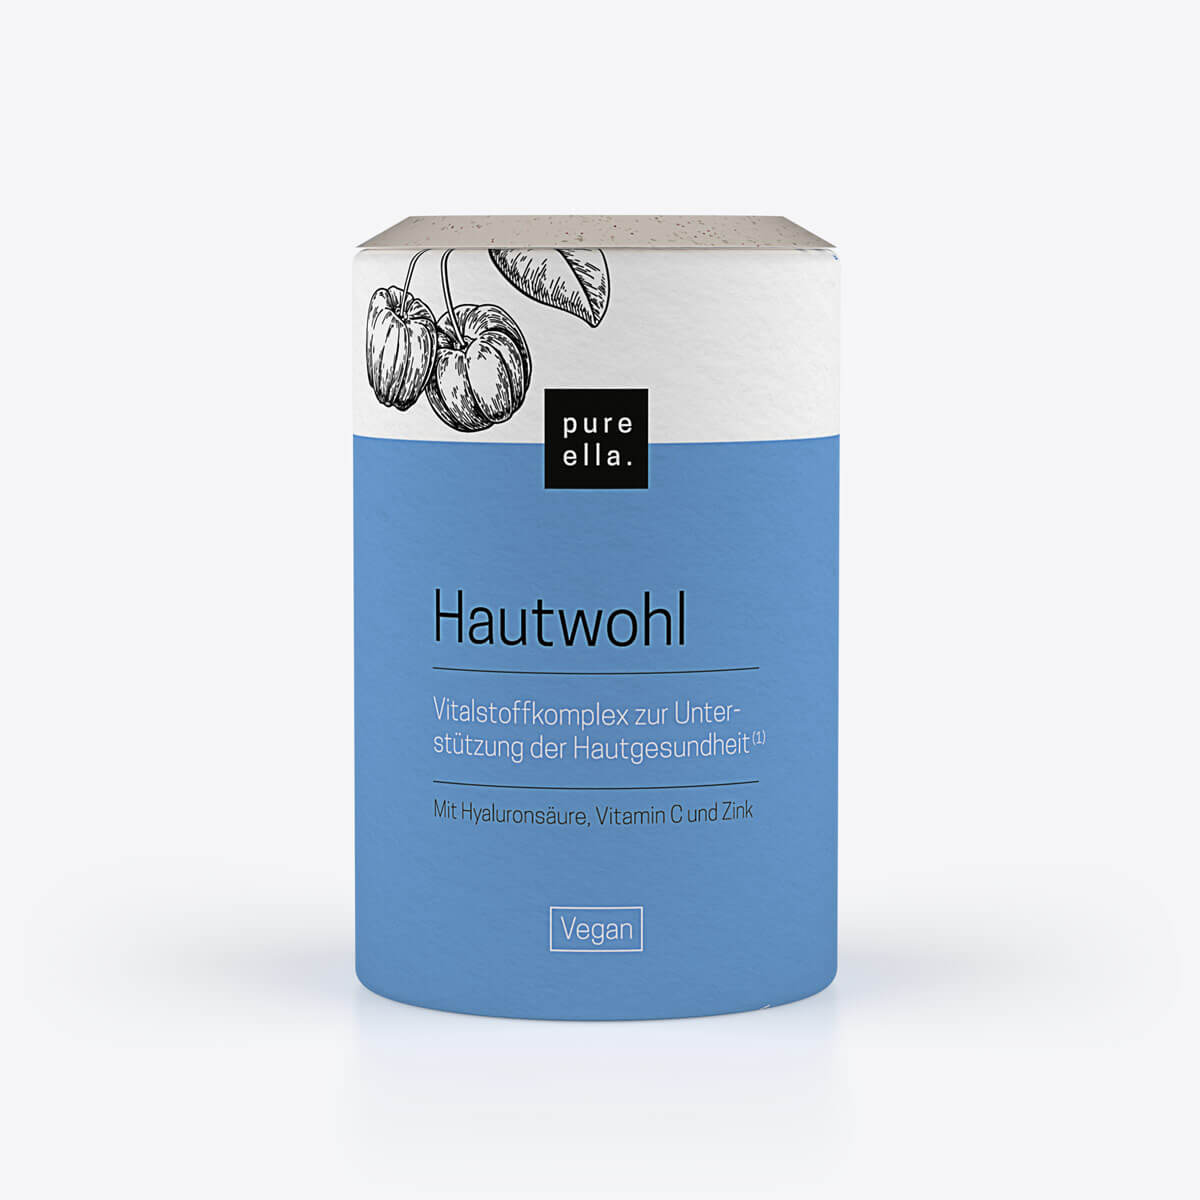 HAUTWOHL